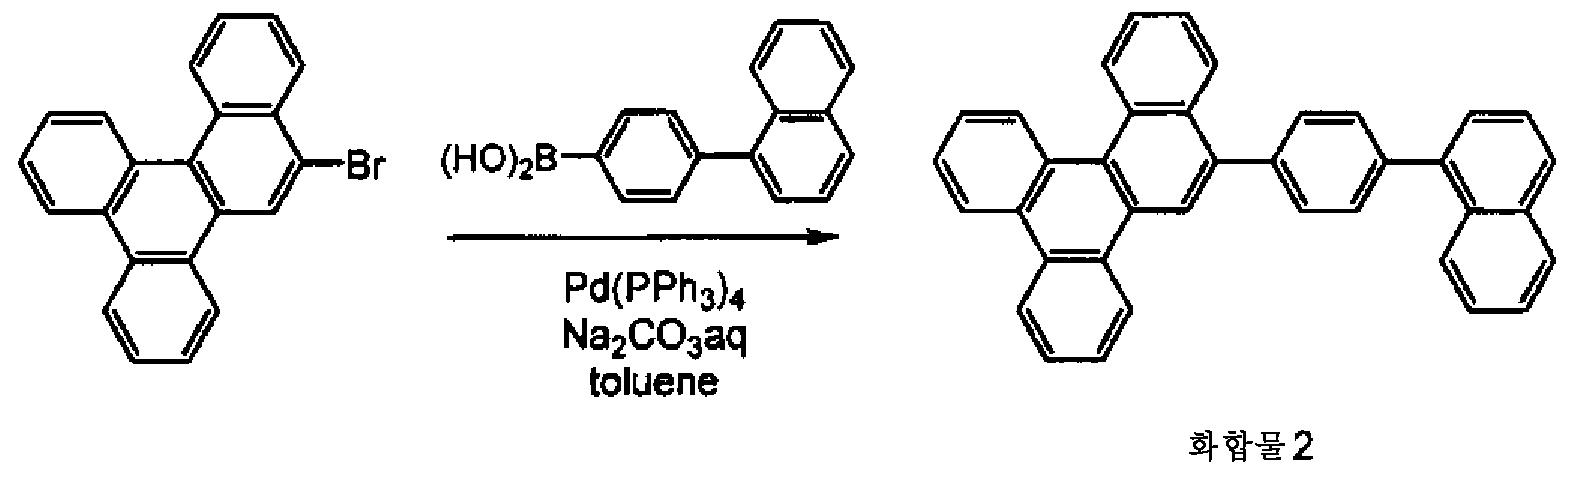 Figure 112010031772612-pct00051